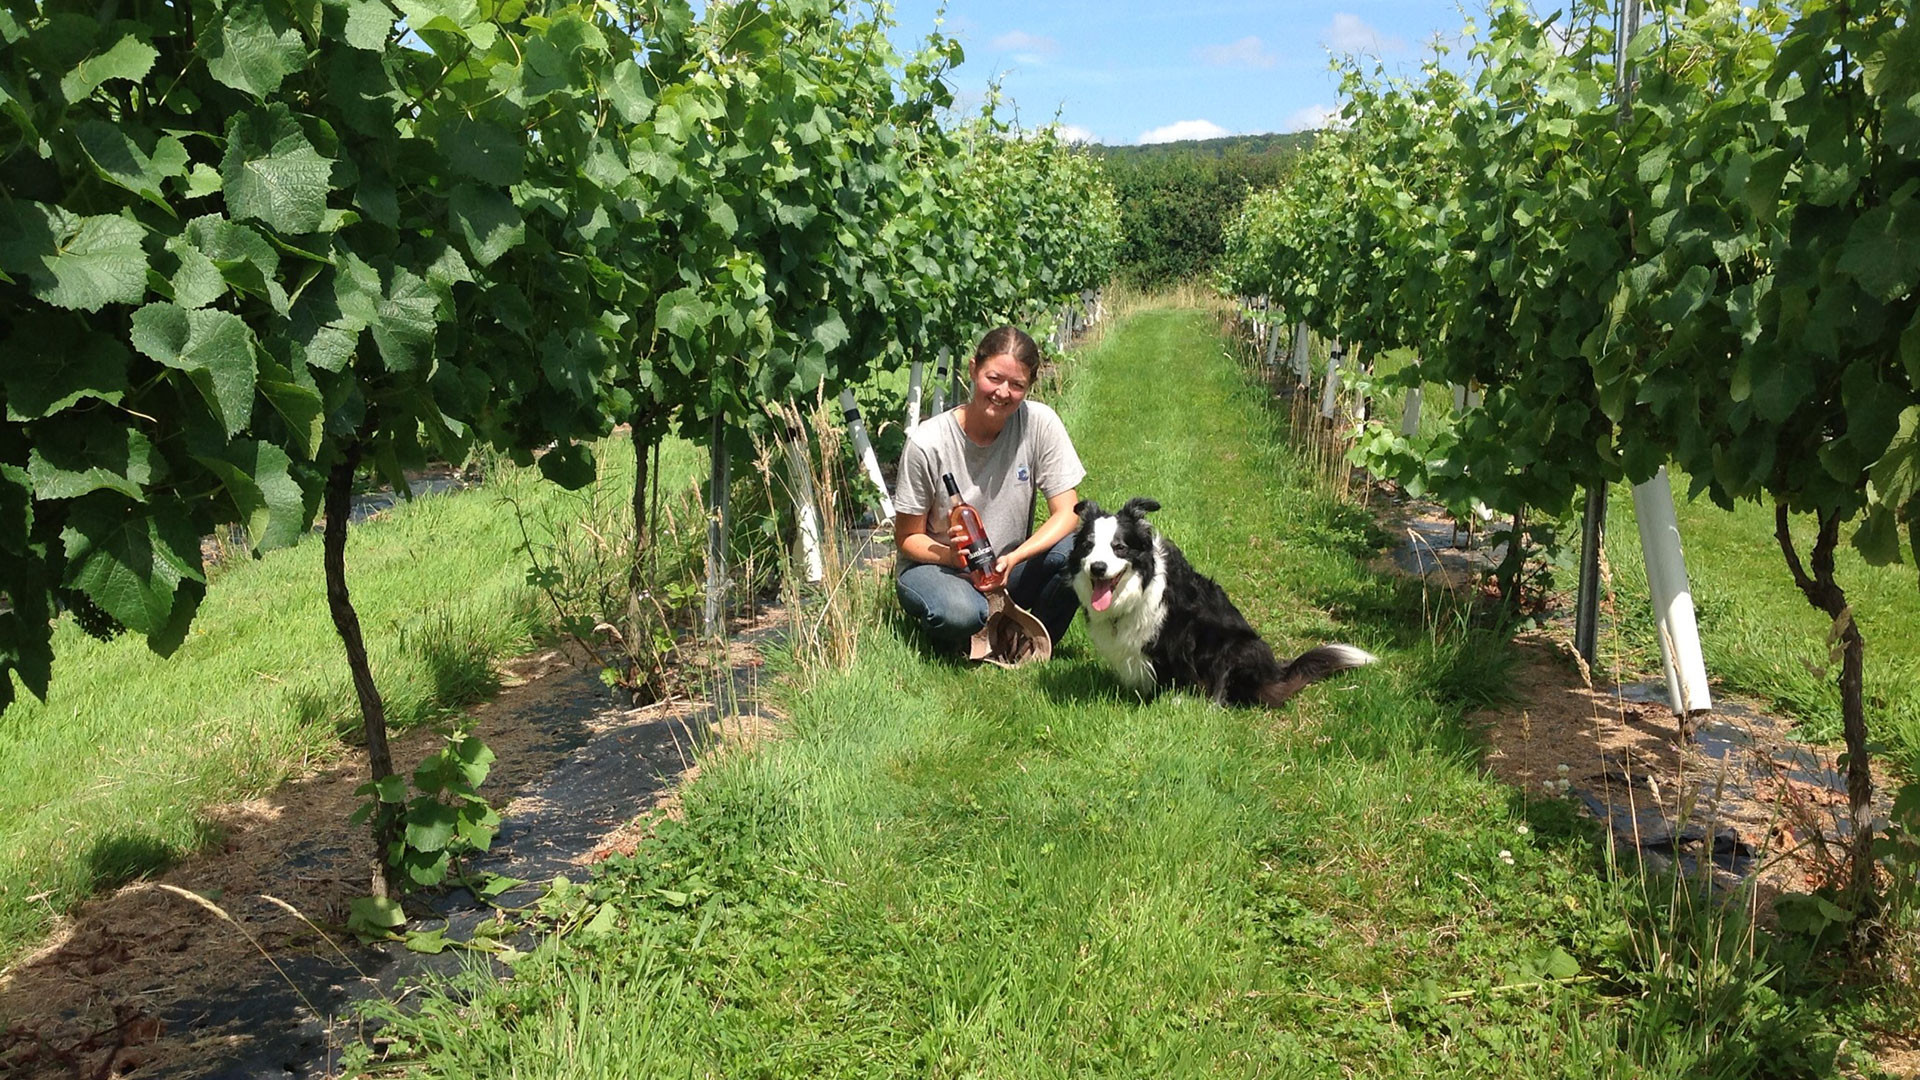 Dunleavy Vineyards